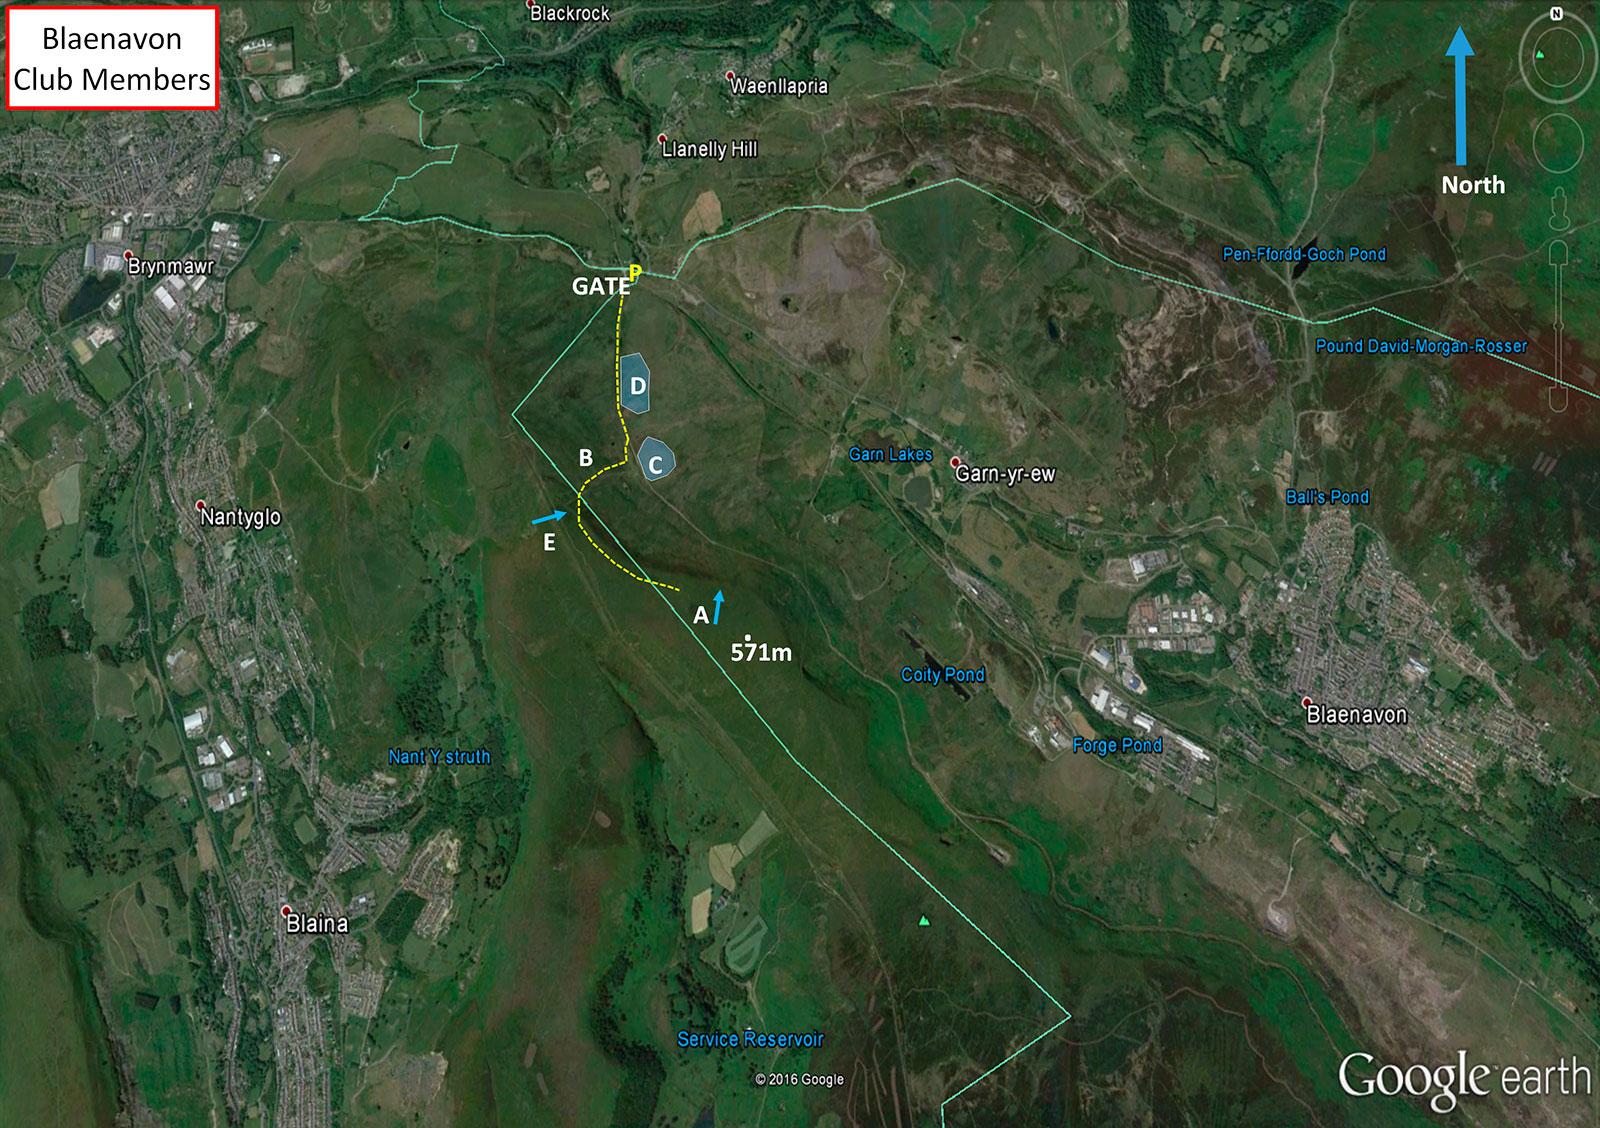 blaenavon-site-image-map